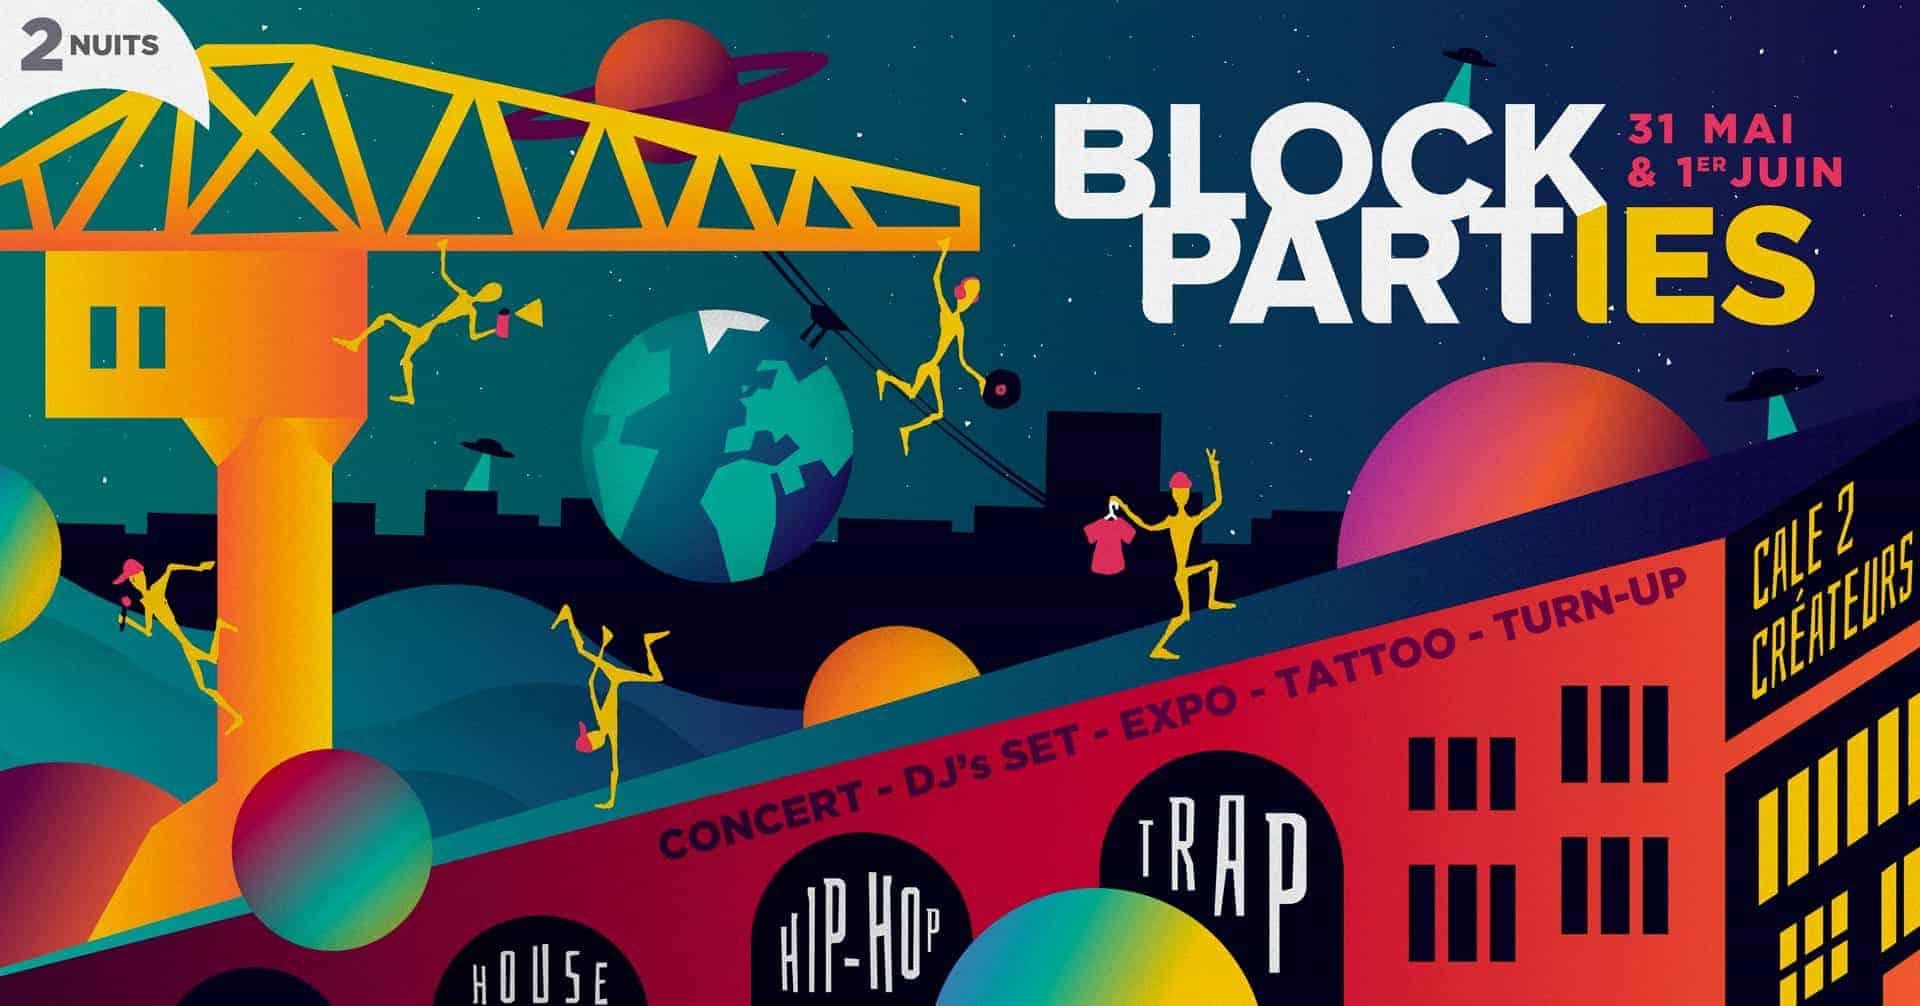 block-party-2019-nefs-flyer